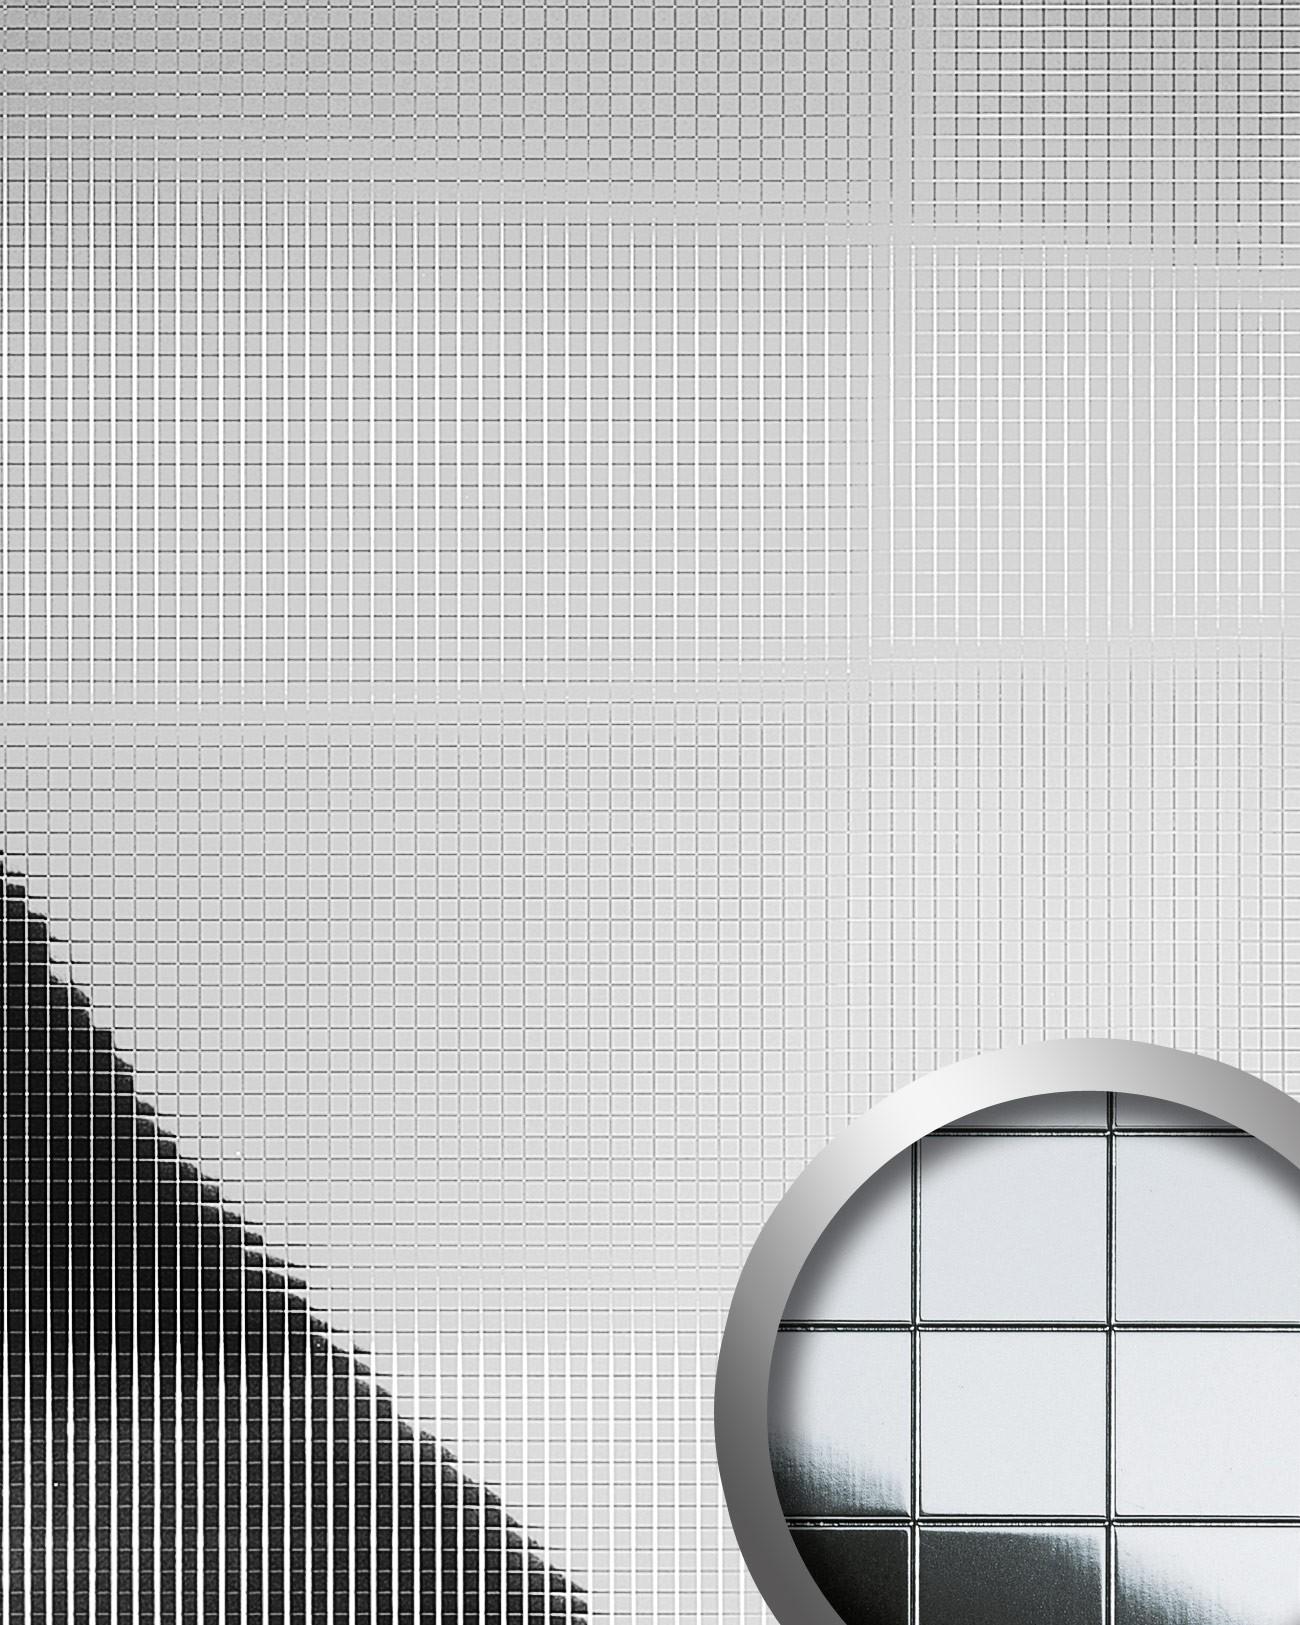 Wandverkleidung Wandpaneel WallFace MStyle Design Paneel - Wandpaneele auf fliesen kleben